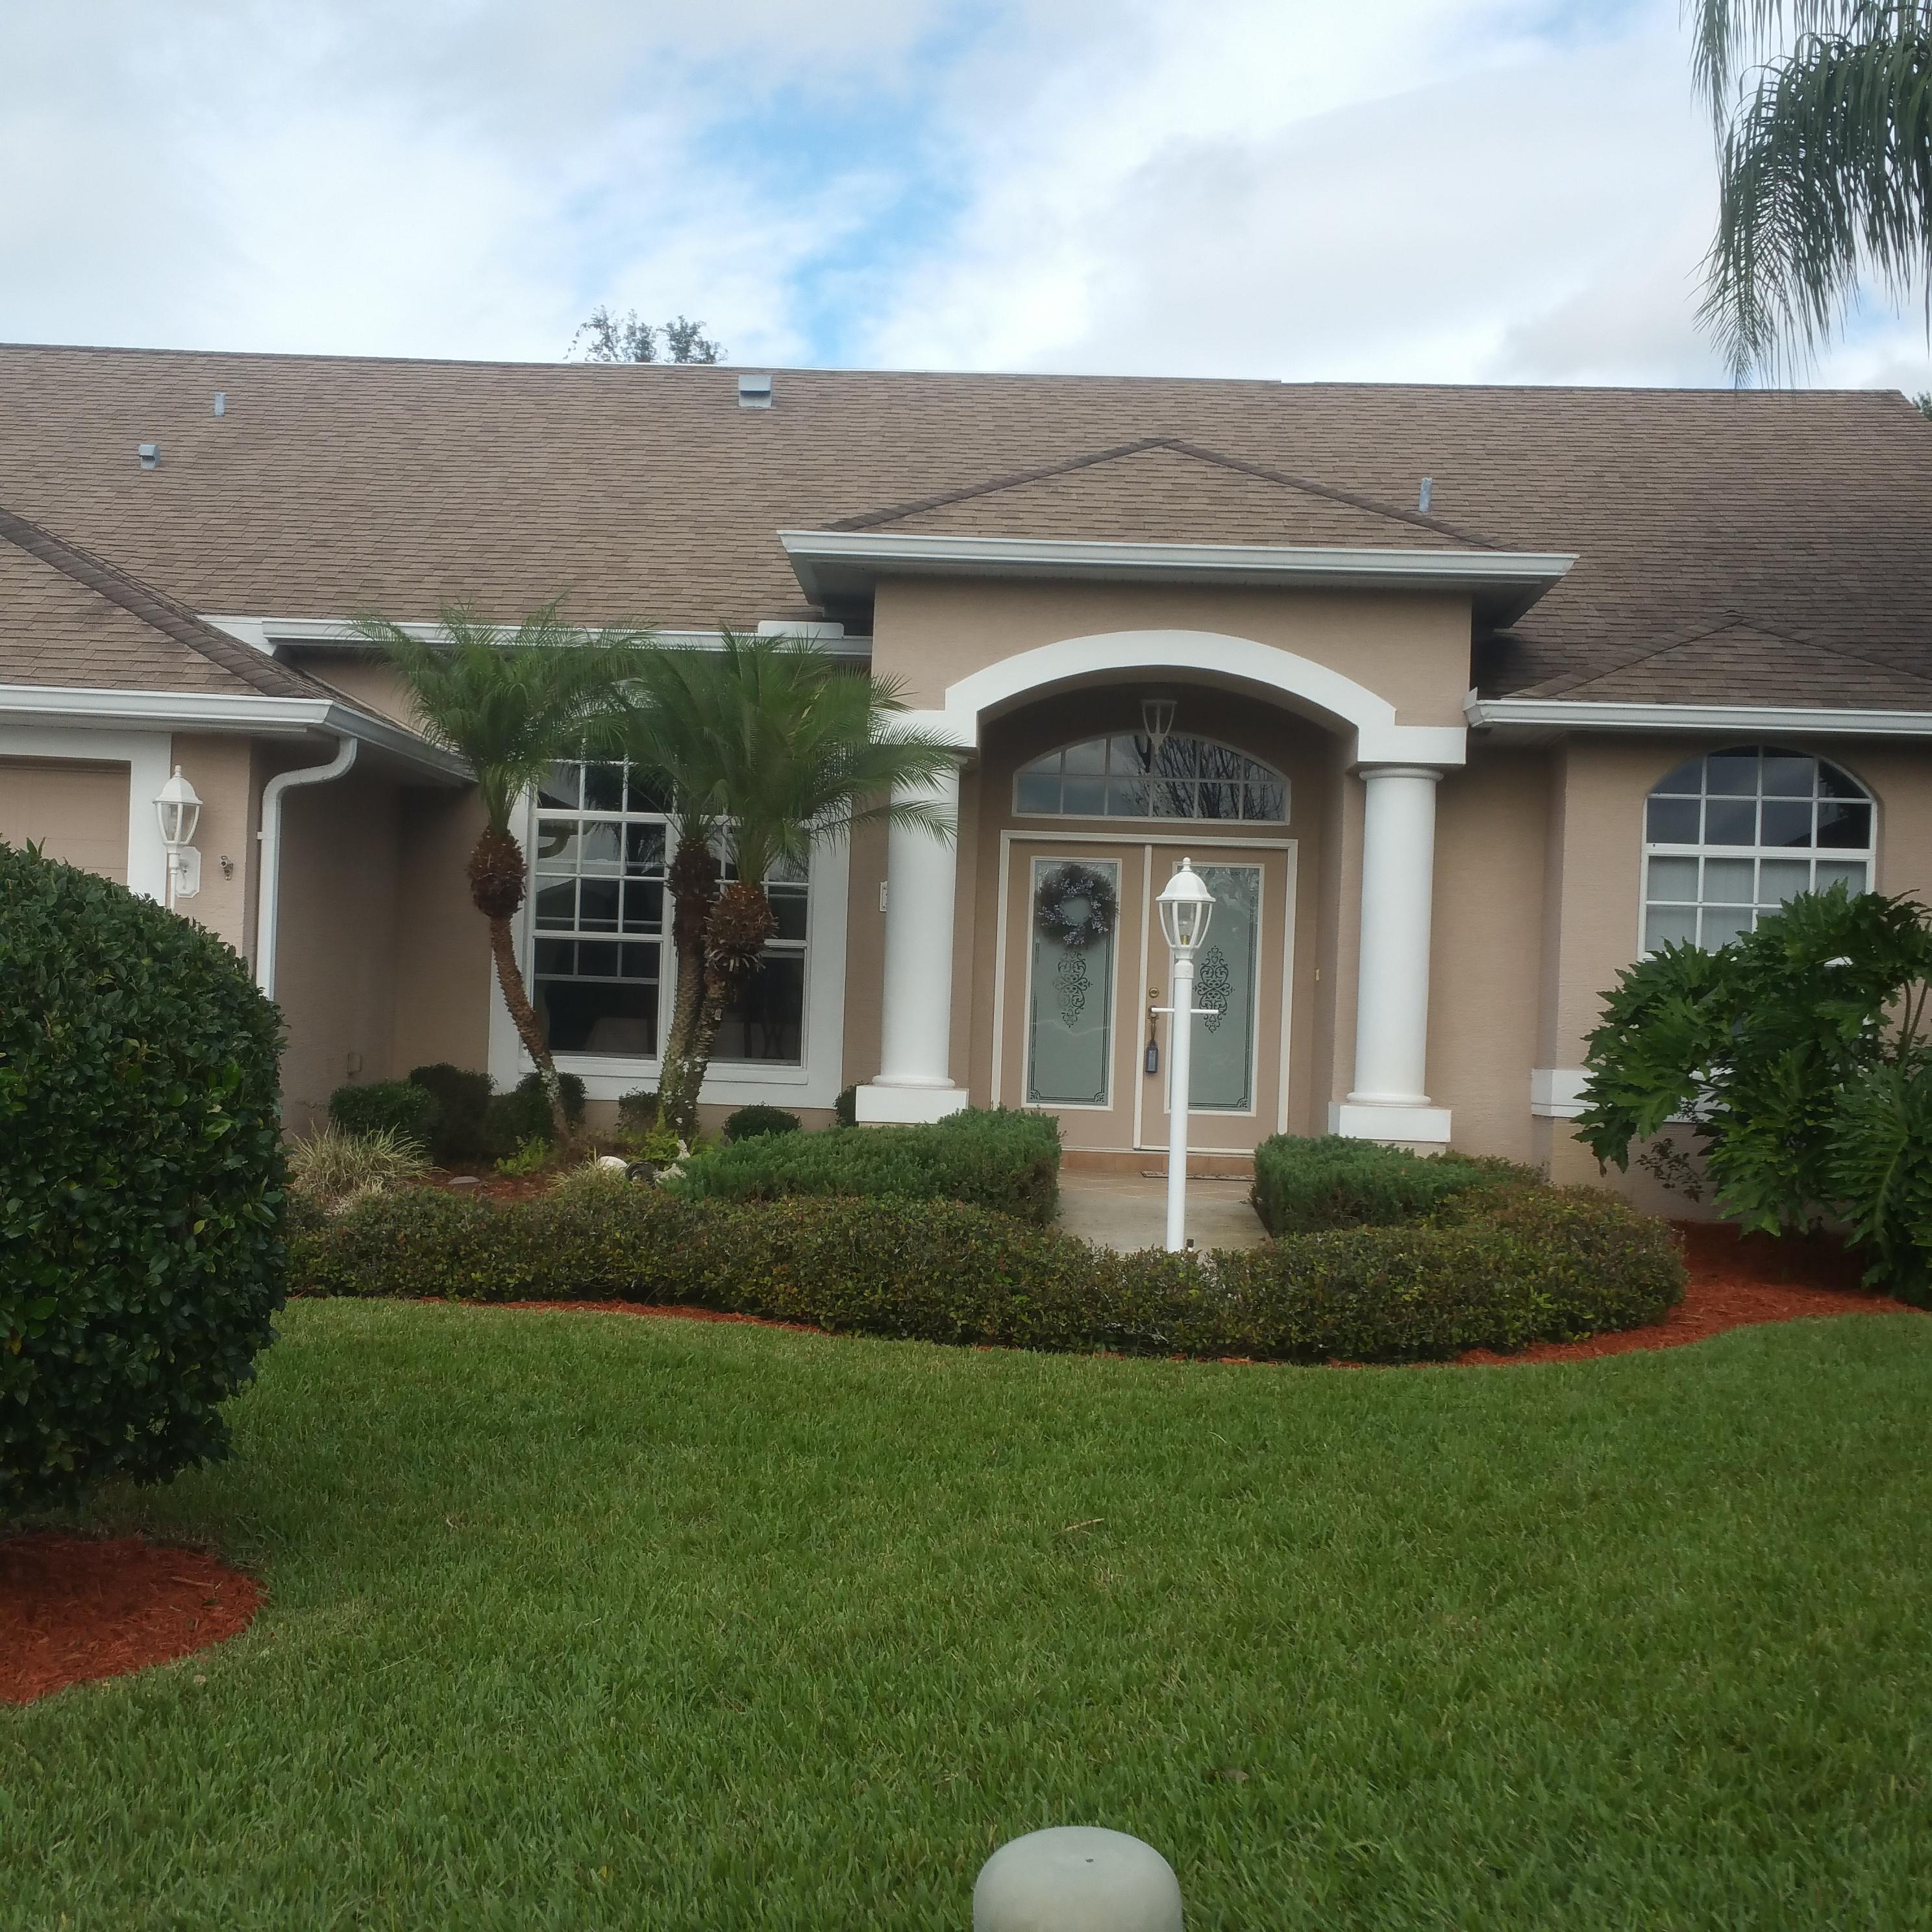 11453 Short Ct., New Port Richey, Florida 34654